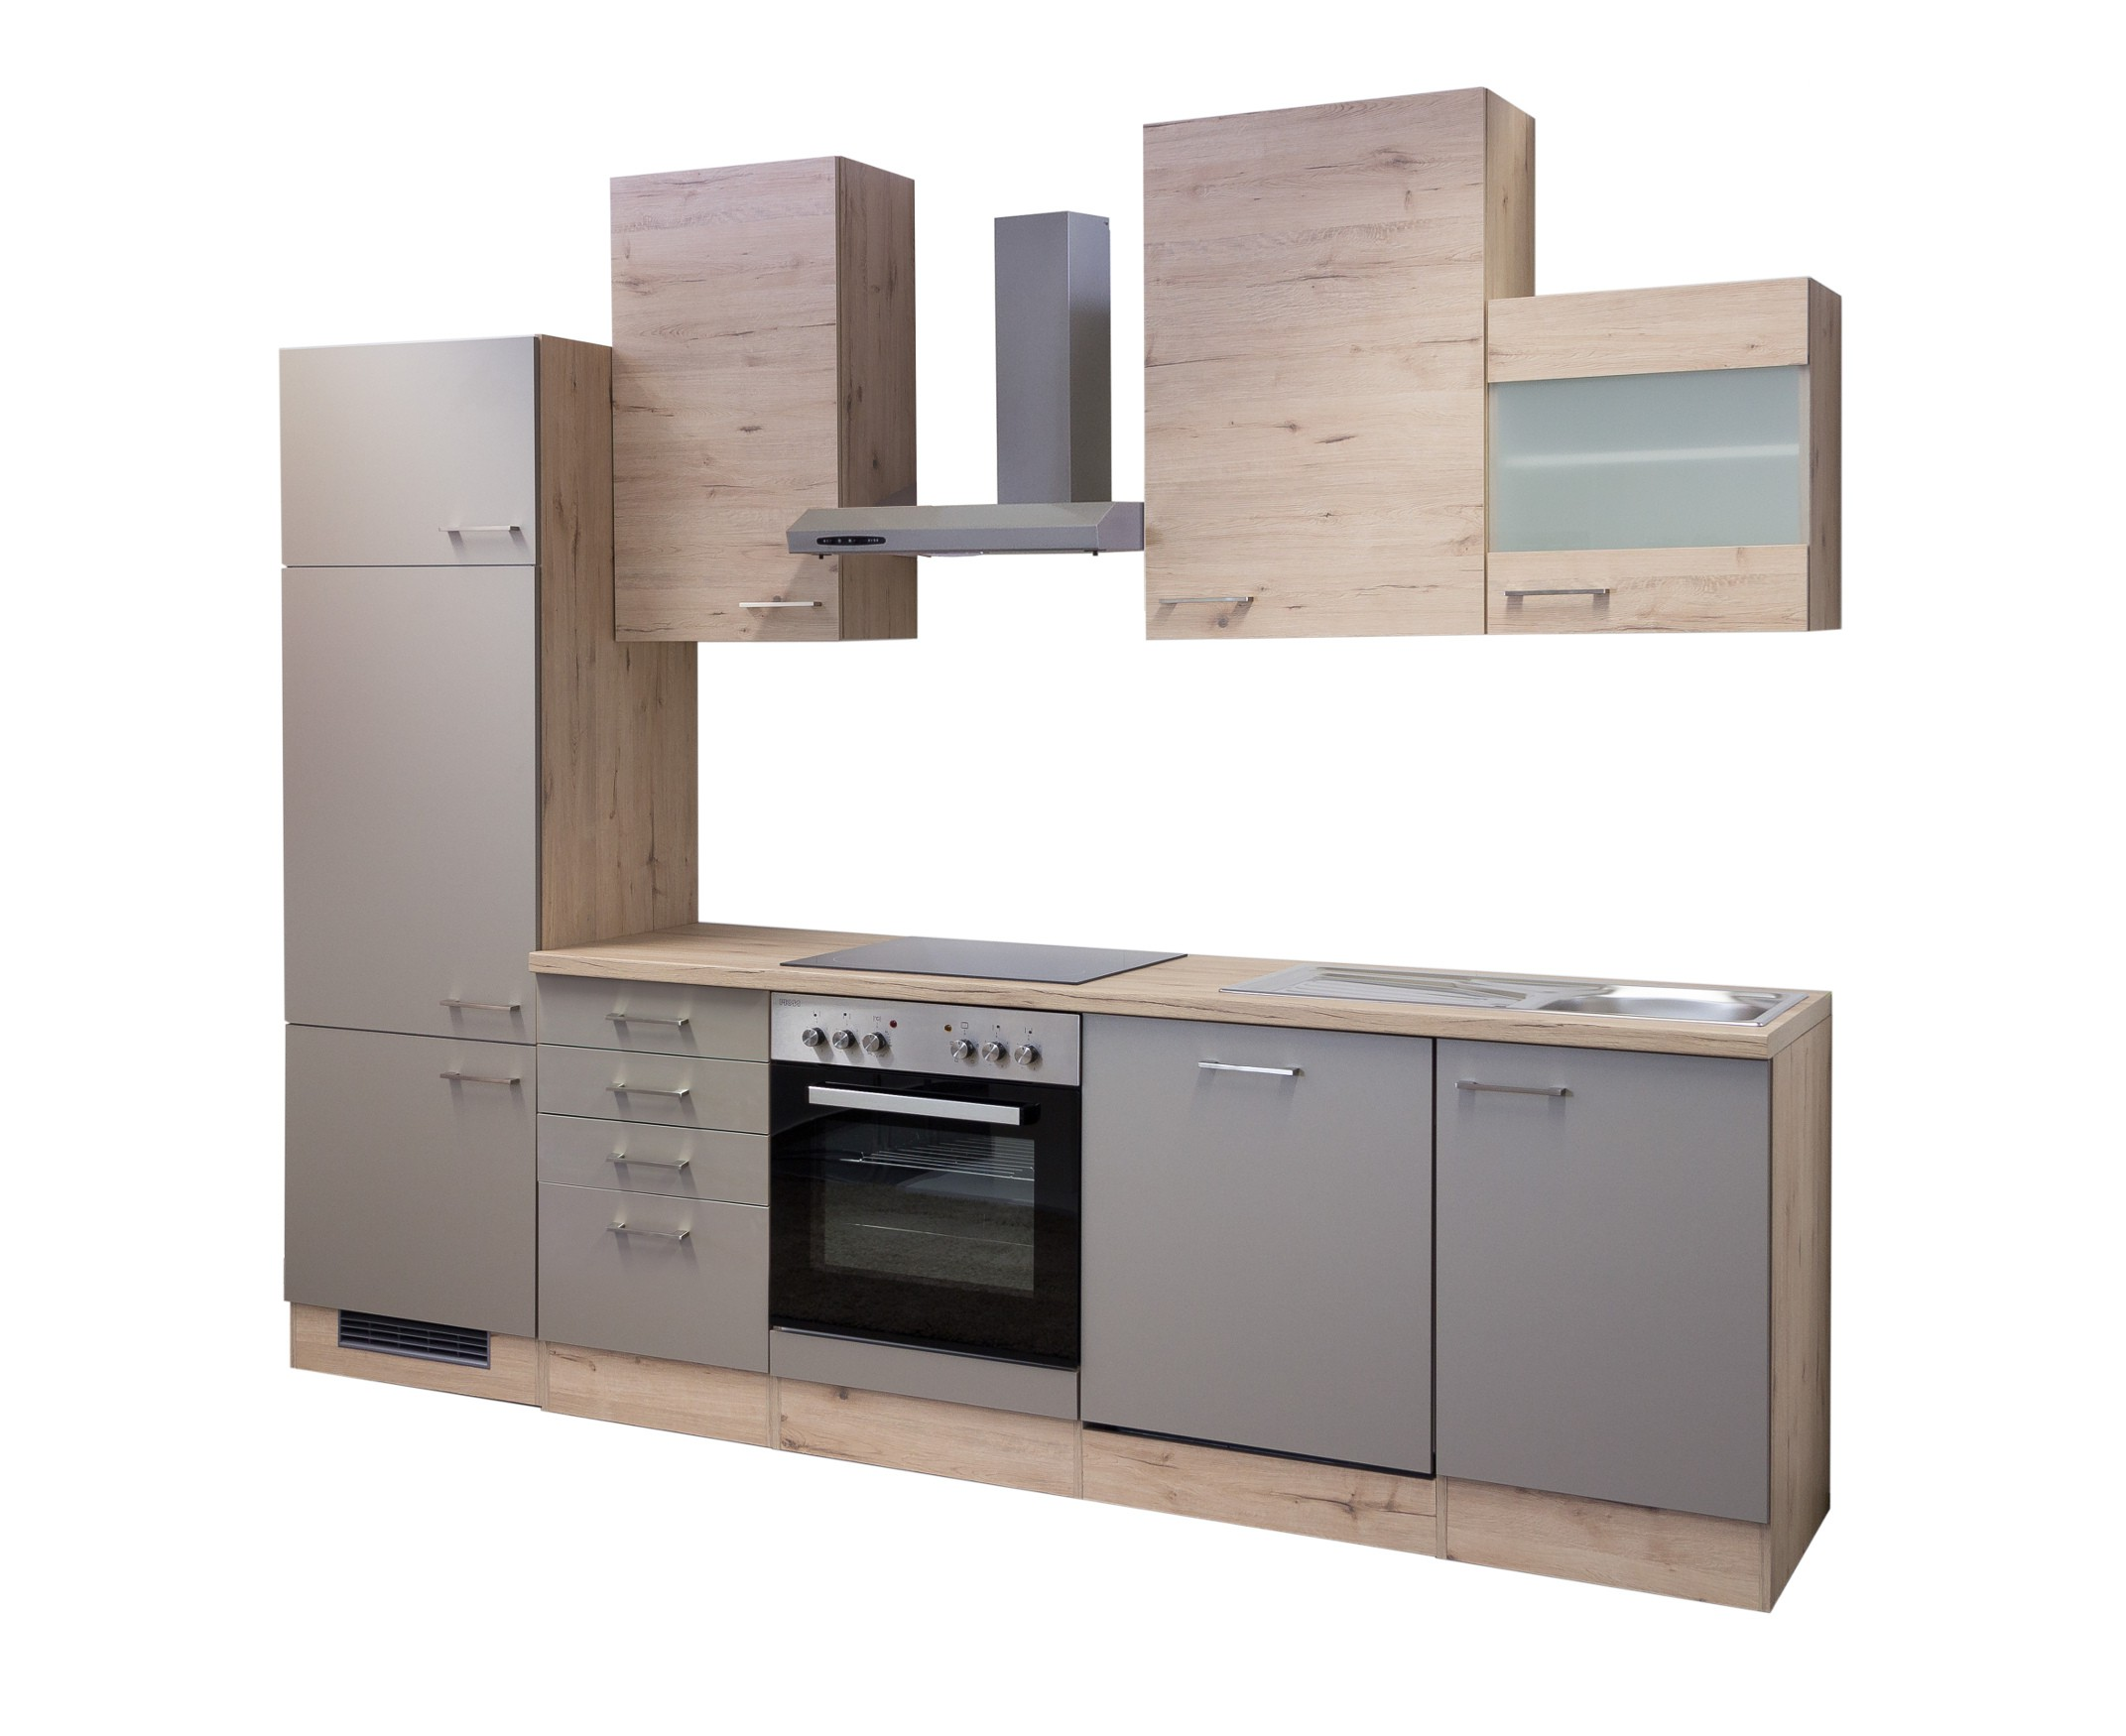 k che riva k chenzeile k chenblock mit elektroger ten 280 cm bronze metallic. Black Bedroom Furniture Sets. Home Design Ideas